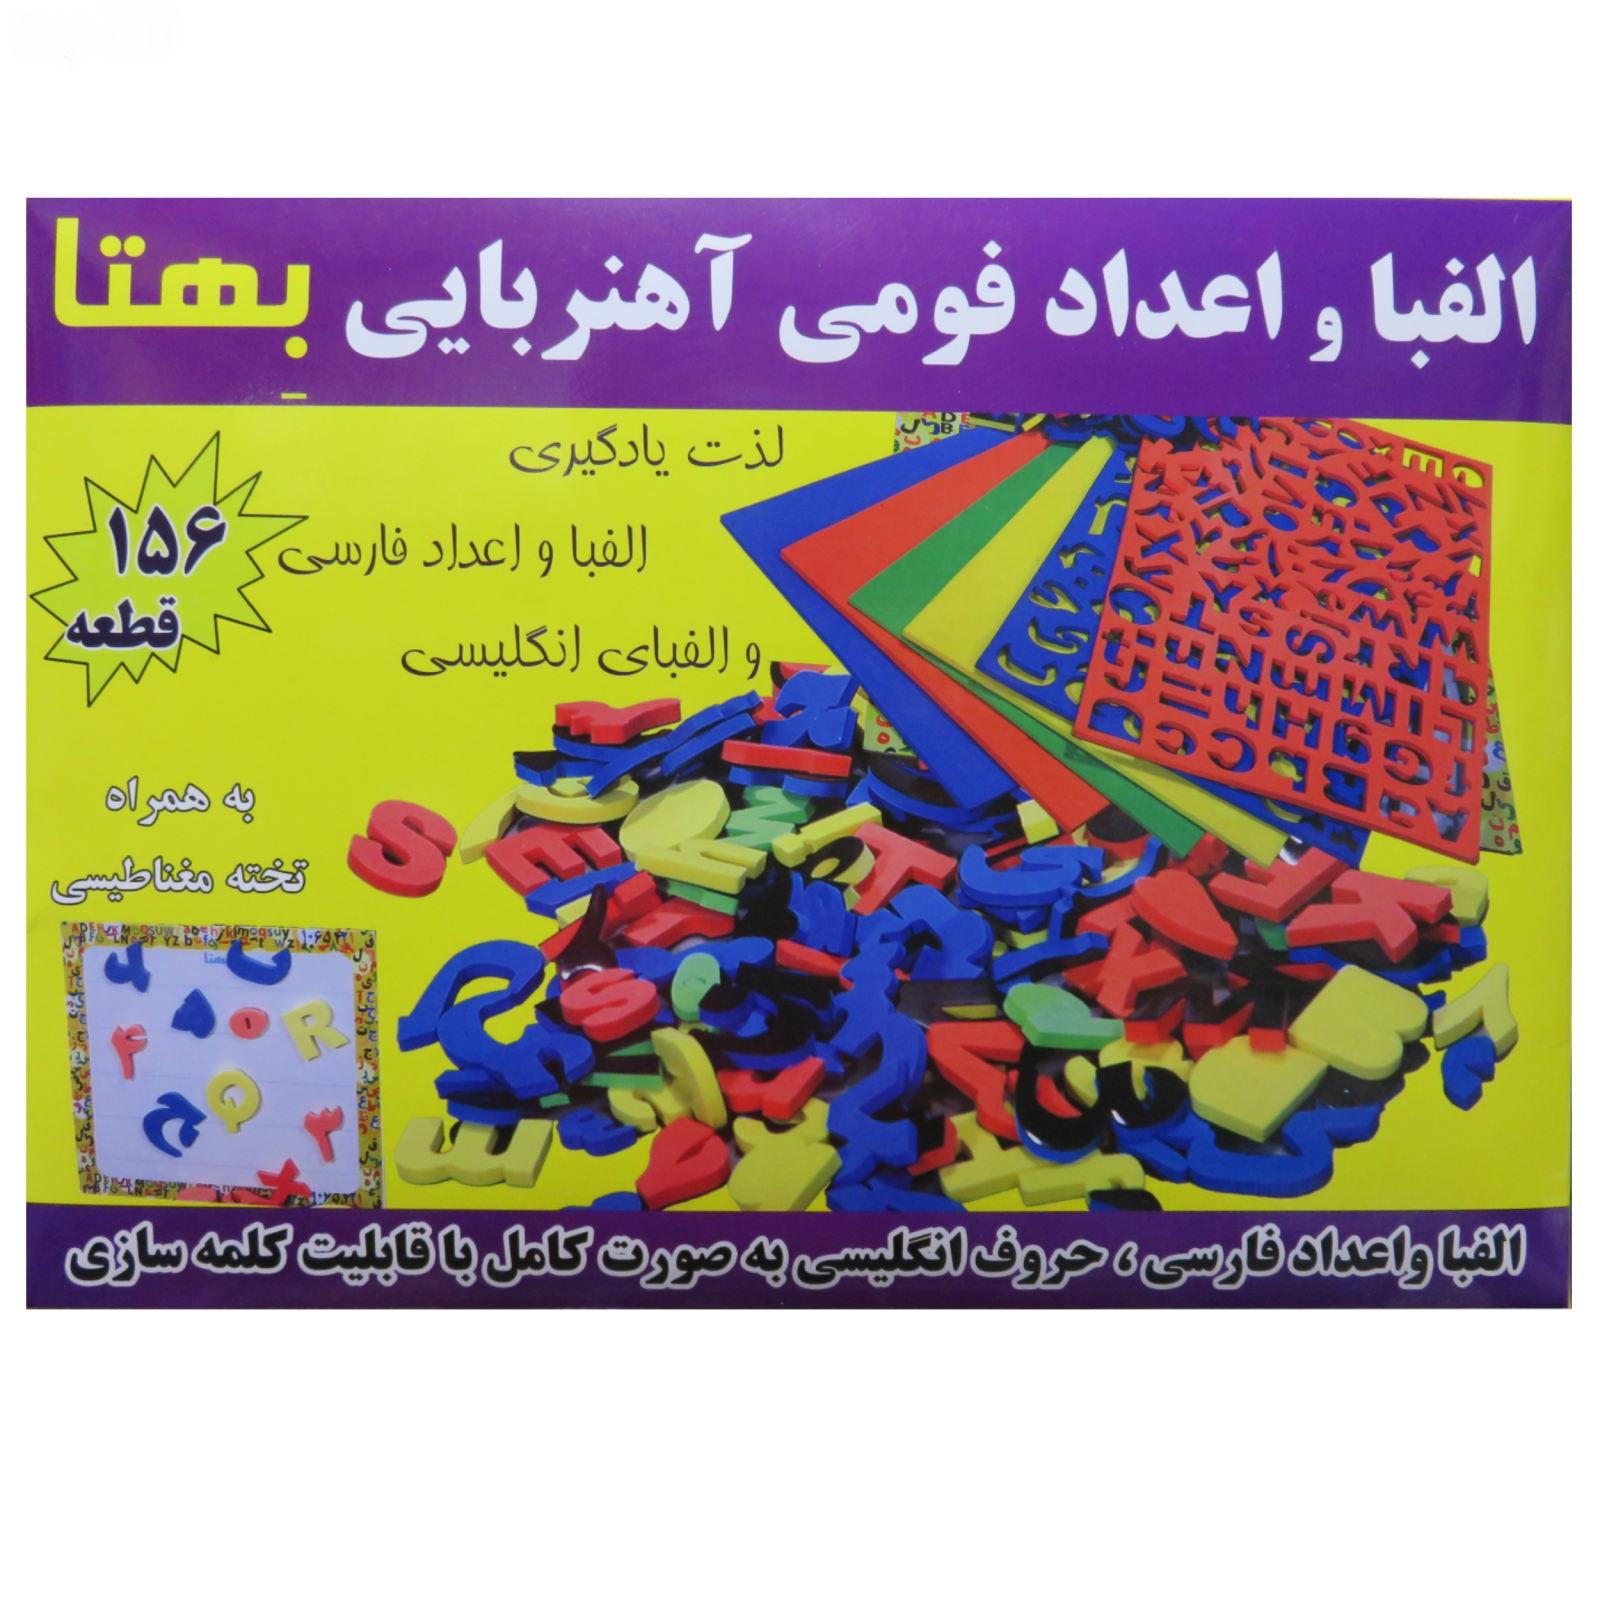 الفبا-و-اعداد-فومي-آهنربايي-156-قطعه-(بهتا)-جعبه-اي